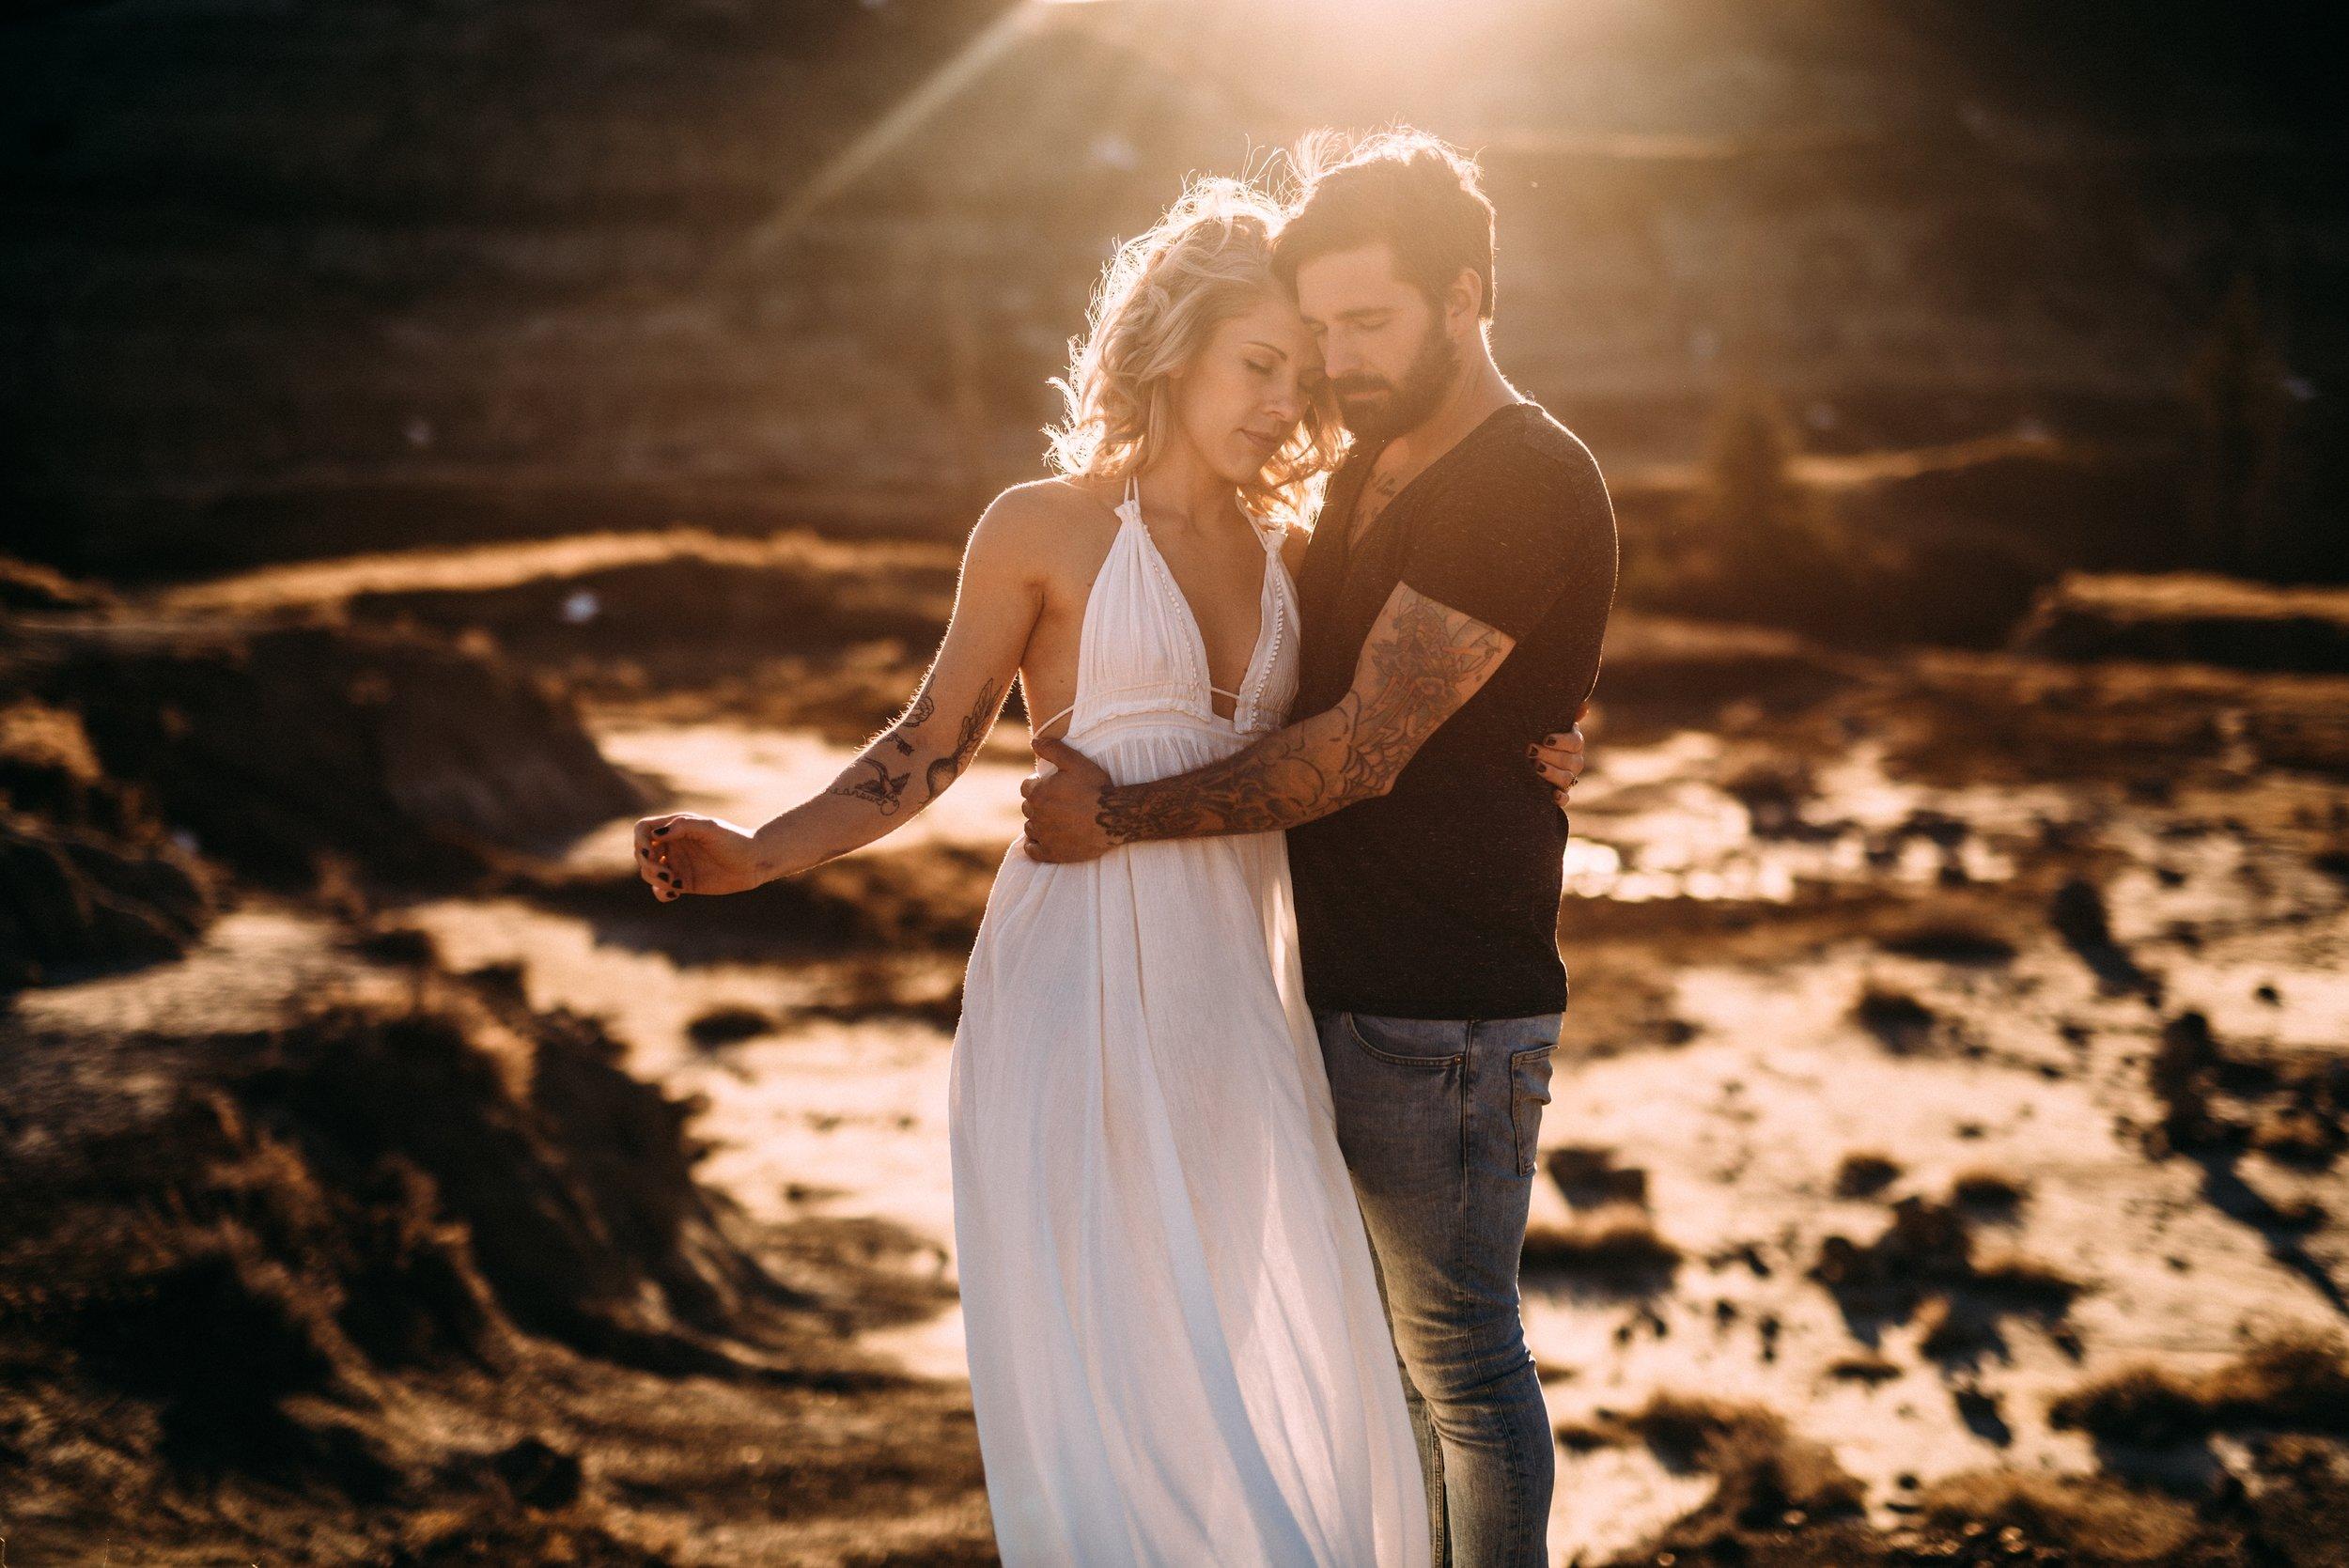 kaihla_tonai_intimate_wedding_elopement_photographer_3589